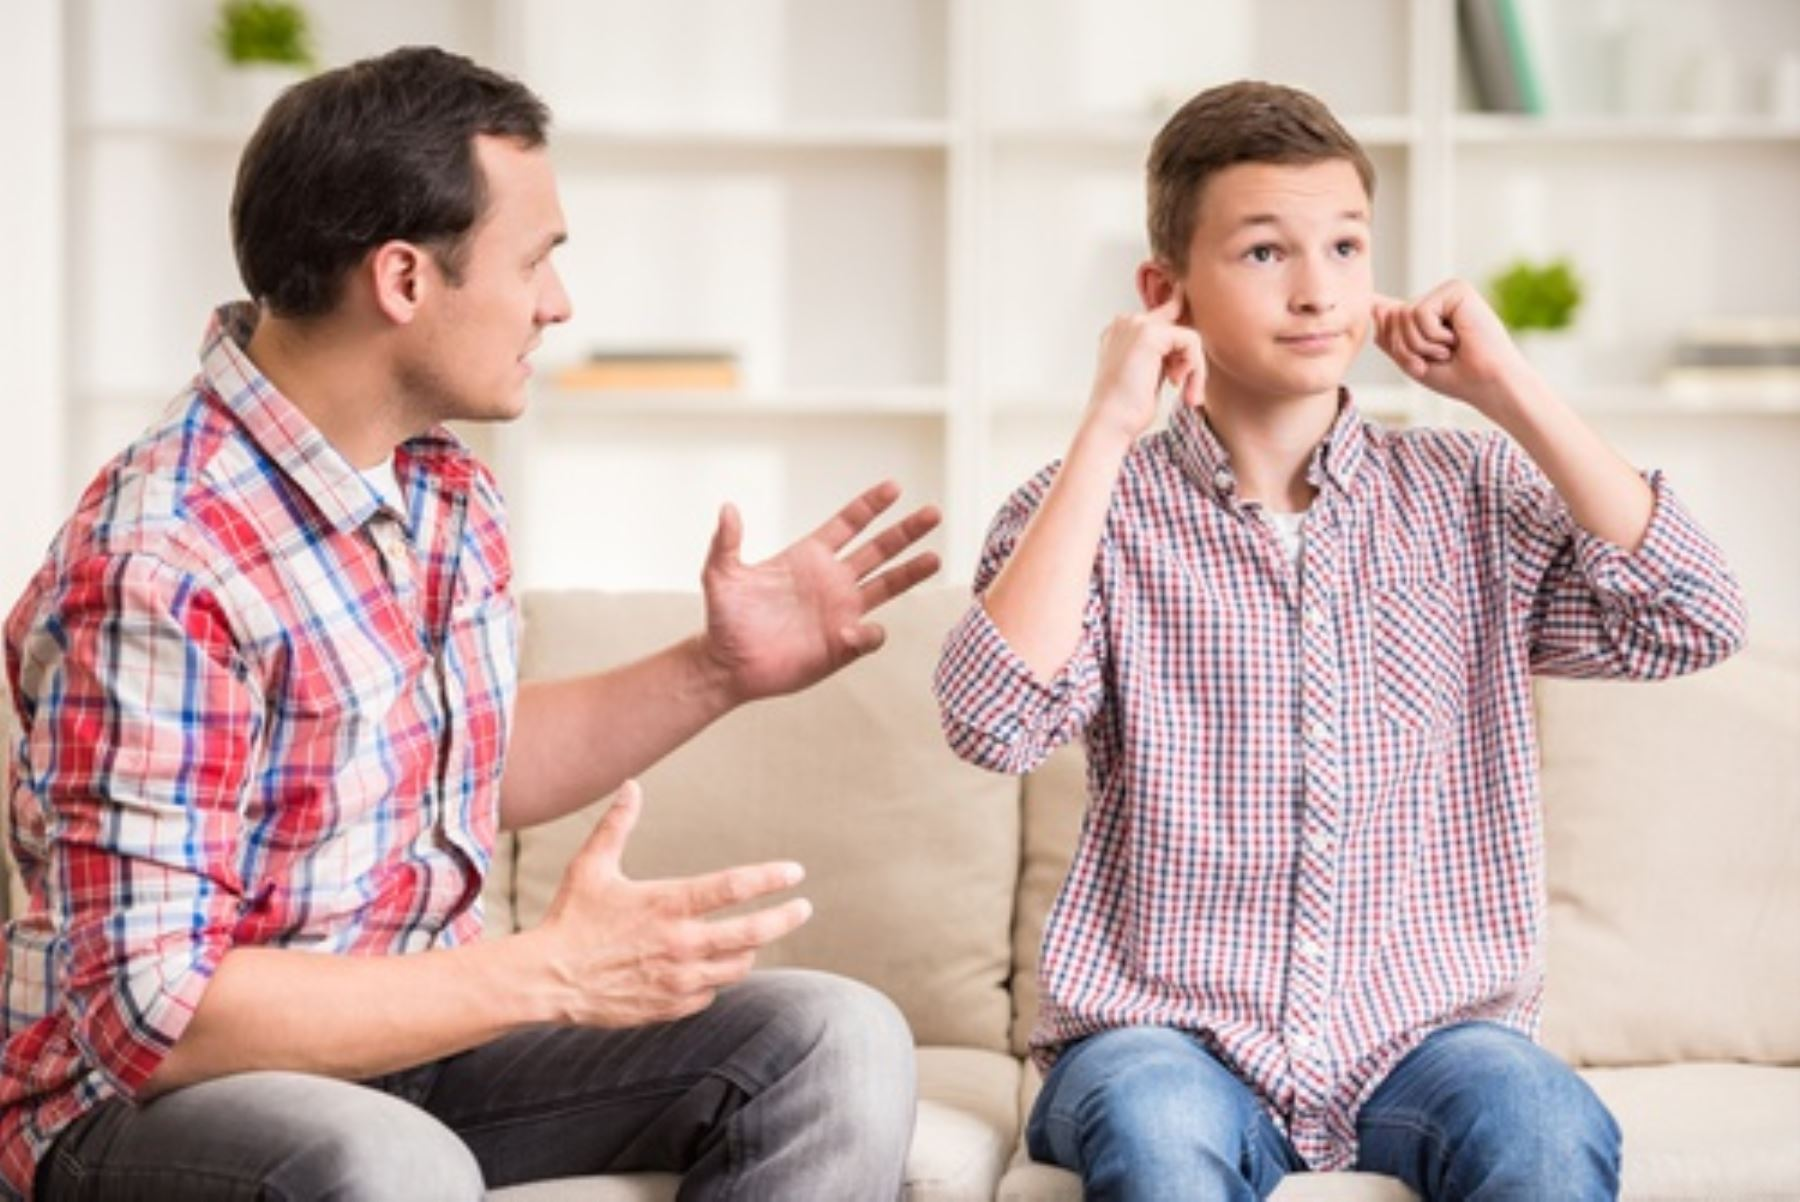 Si no respetan a sus propios padres, no es posible imaginar que respeten a la autoridad, señala experto en salud mental. Foto: Foto: Revista Latina